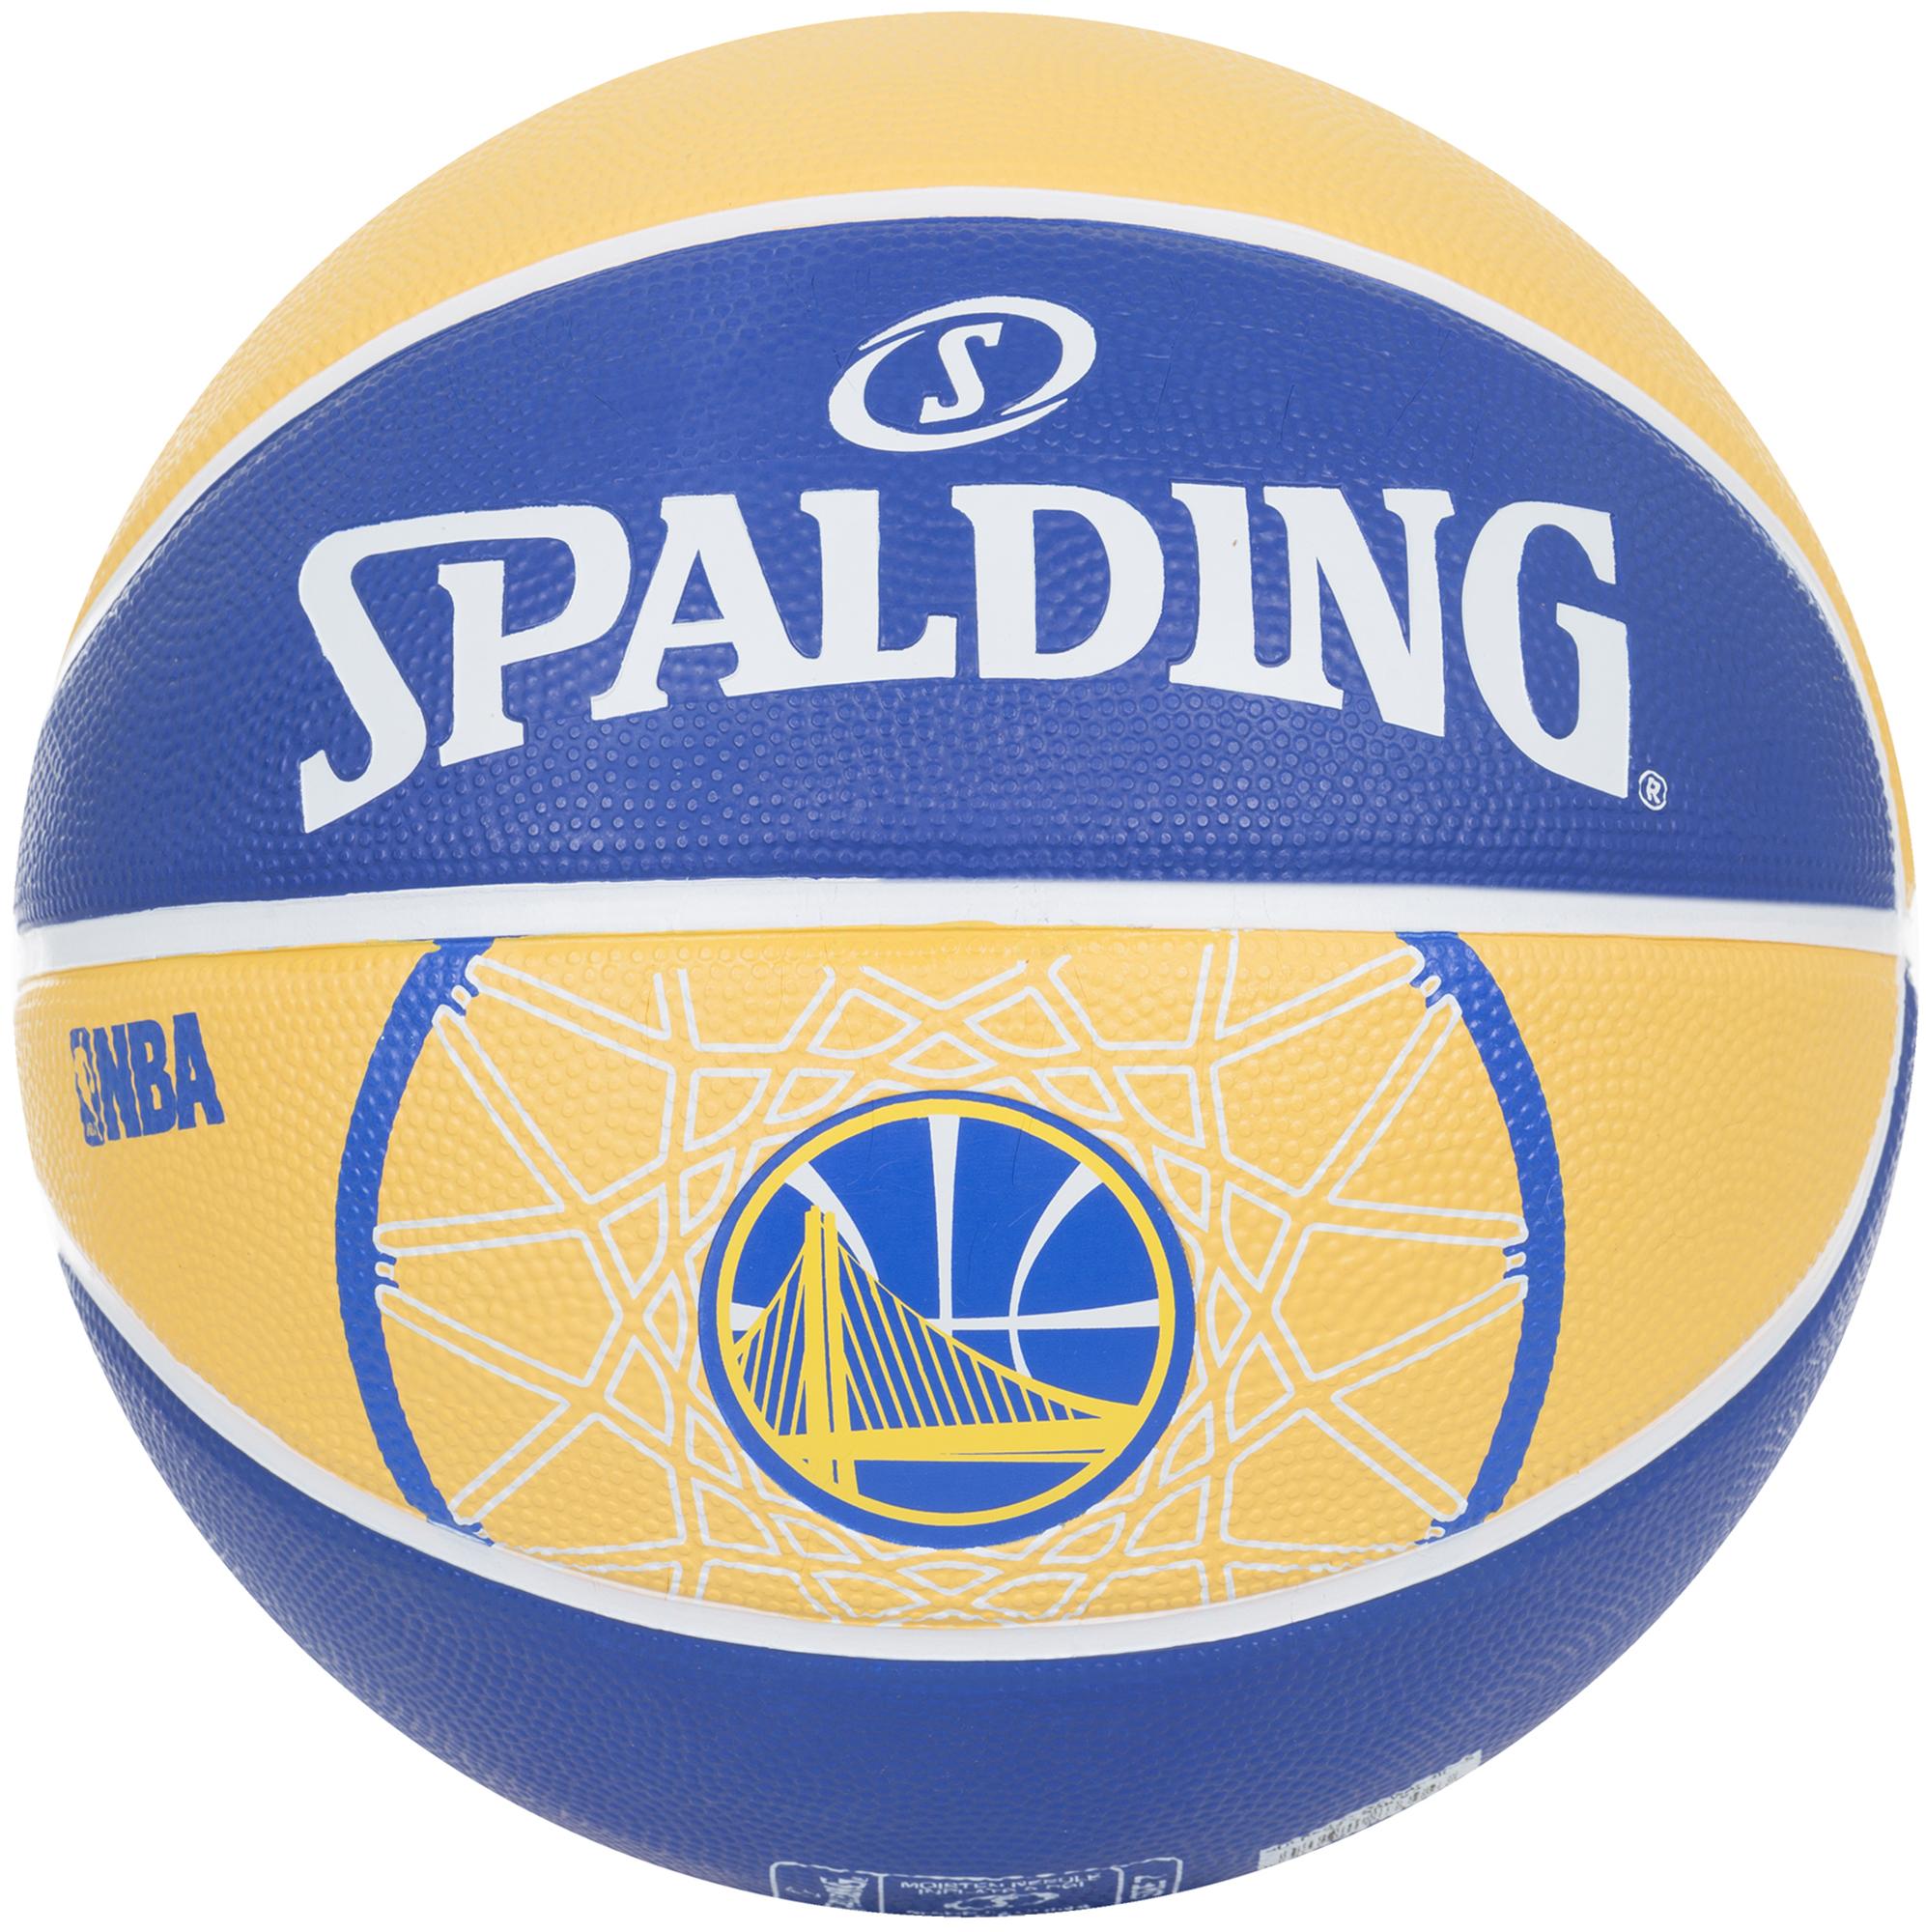 Spalding Мяч баскетбольный Spalding Golden State баскетбольный мяч nike dominate